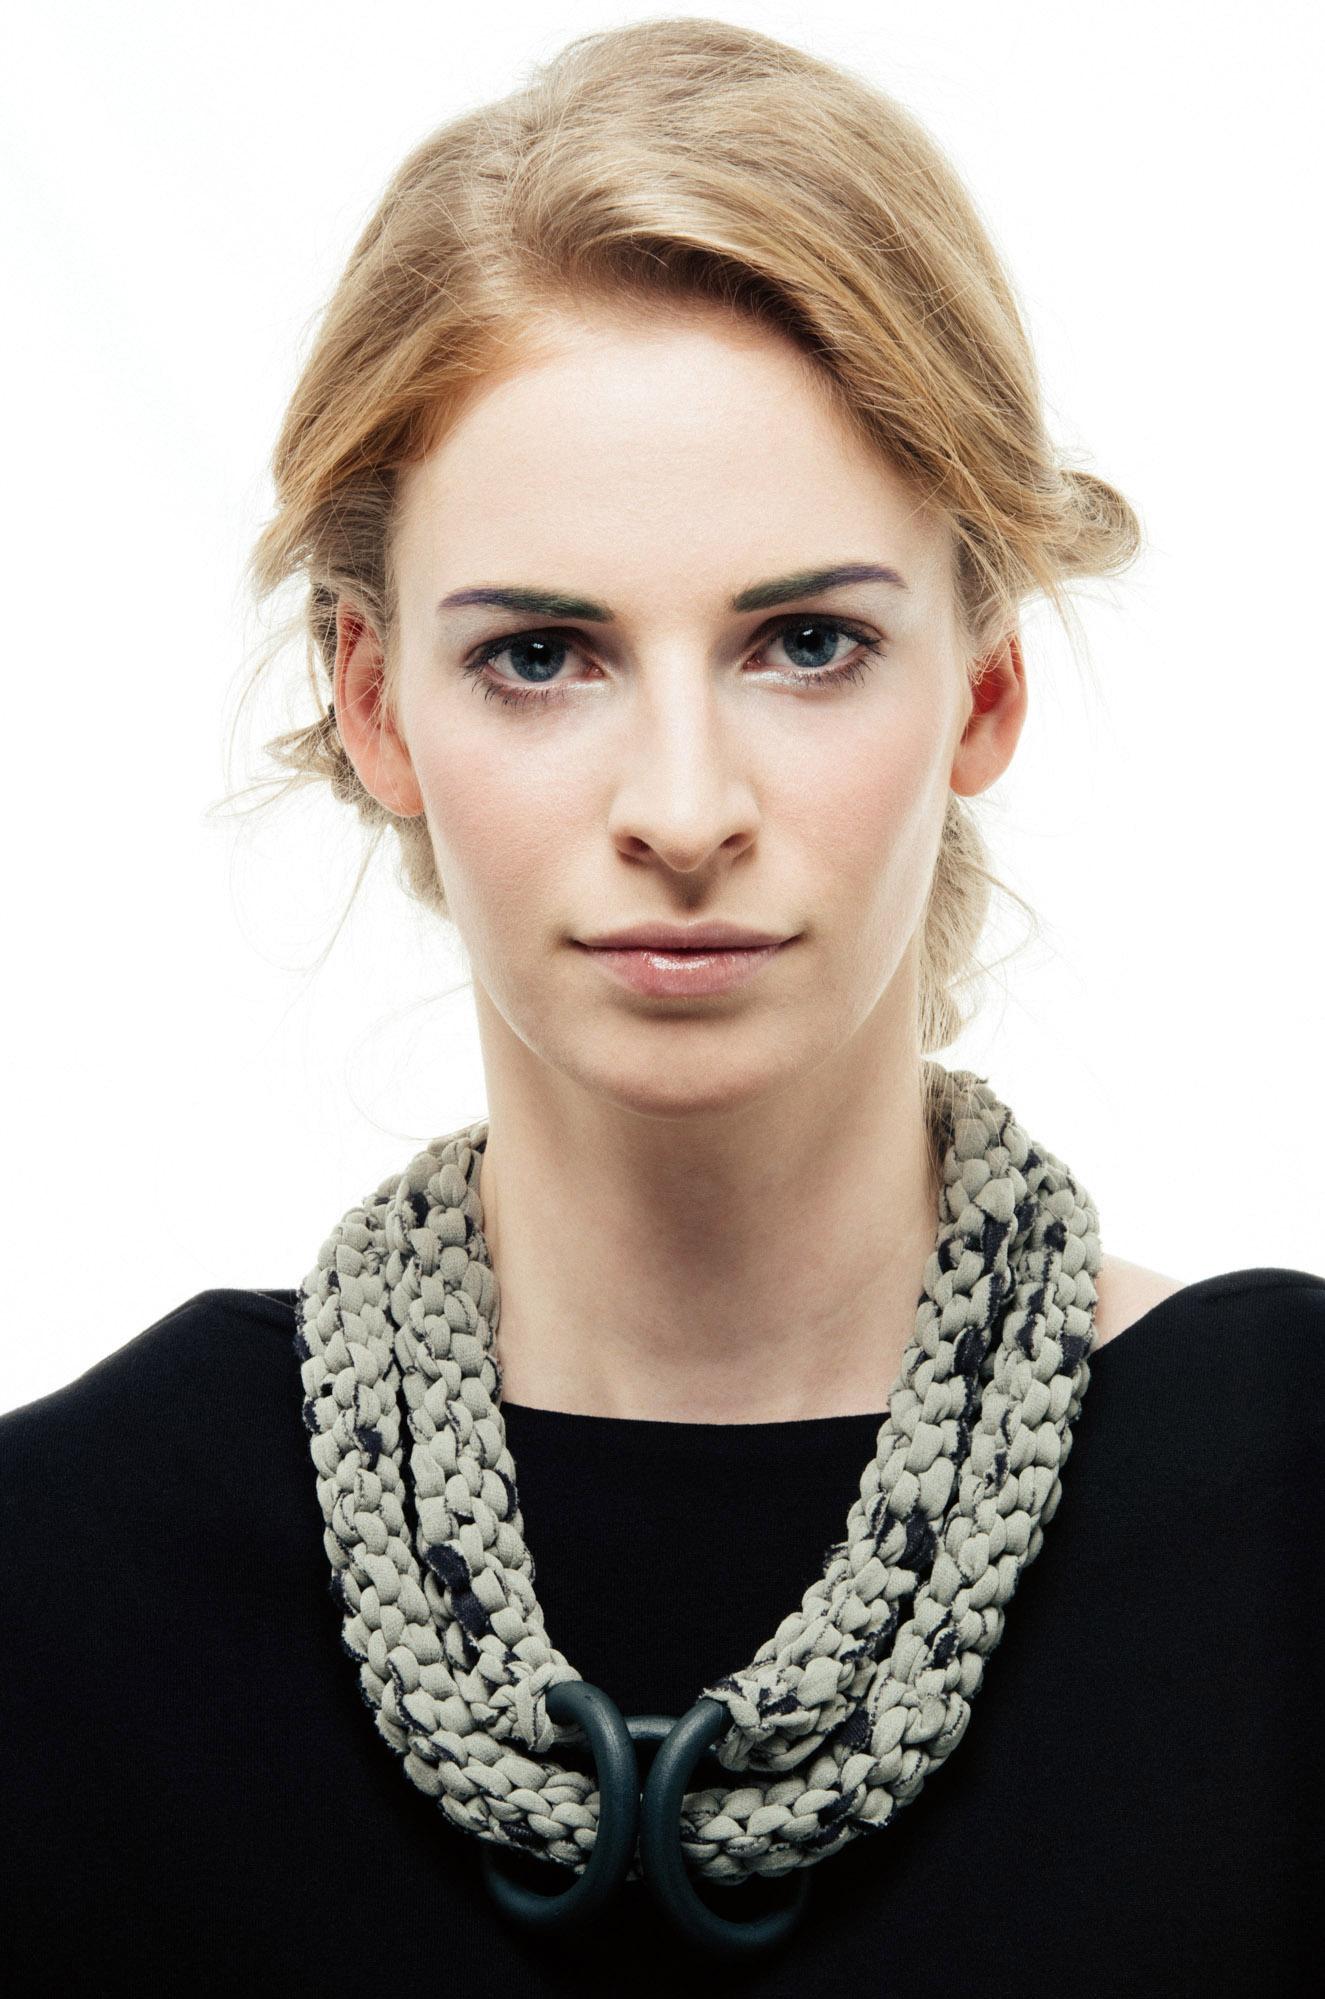 Bocco necklace by Anna Borshi 04.jpg